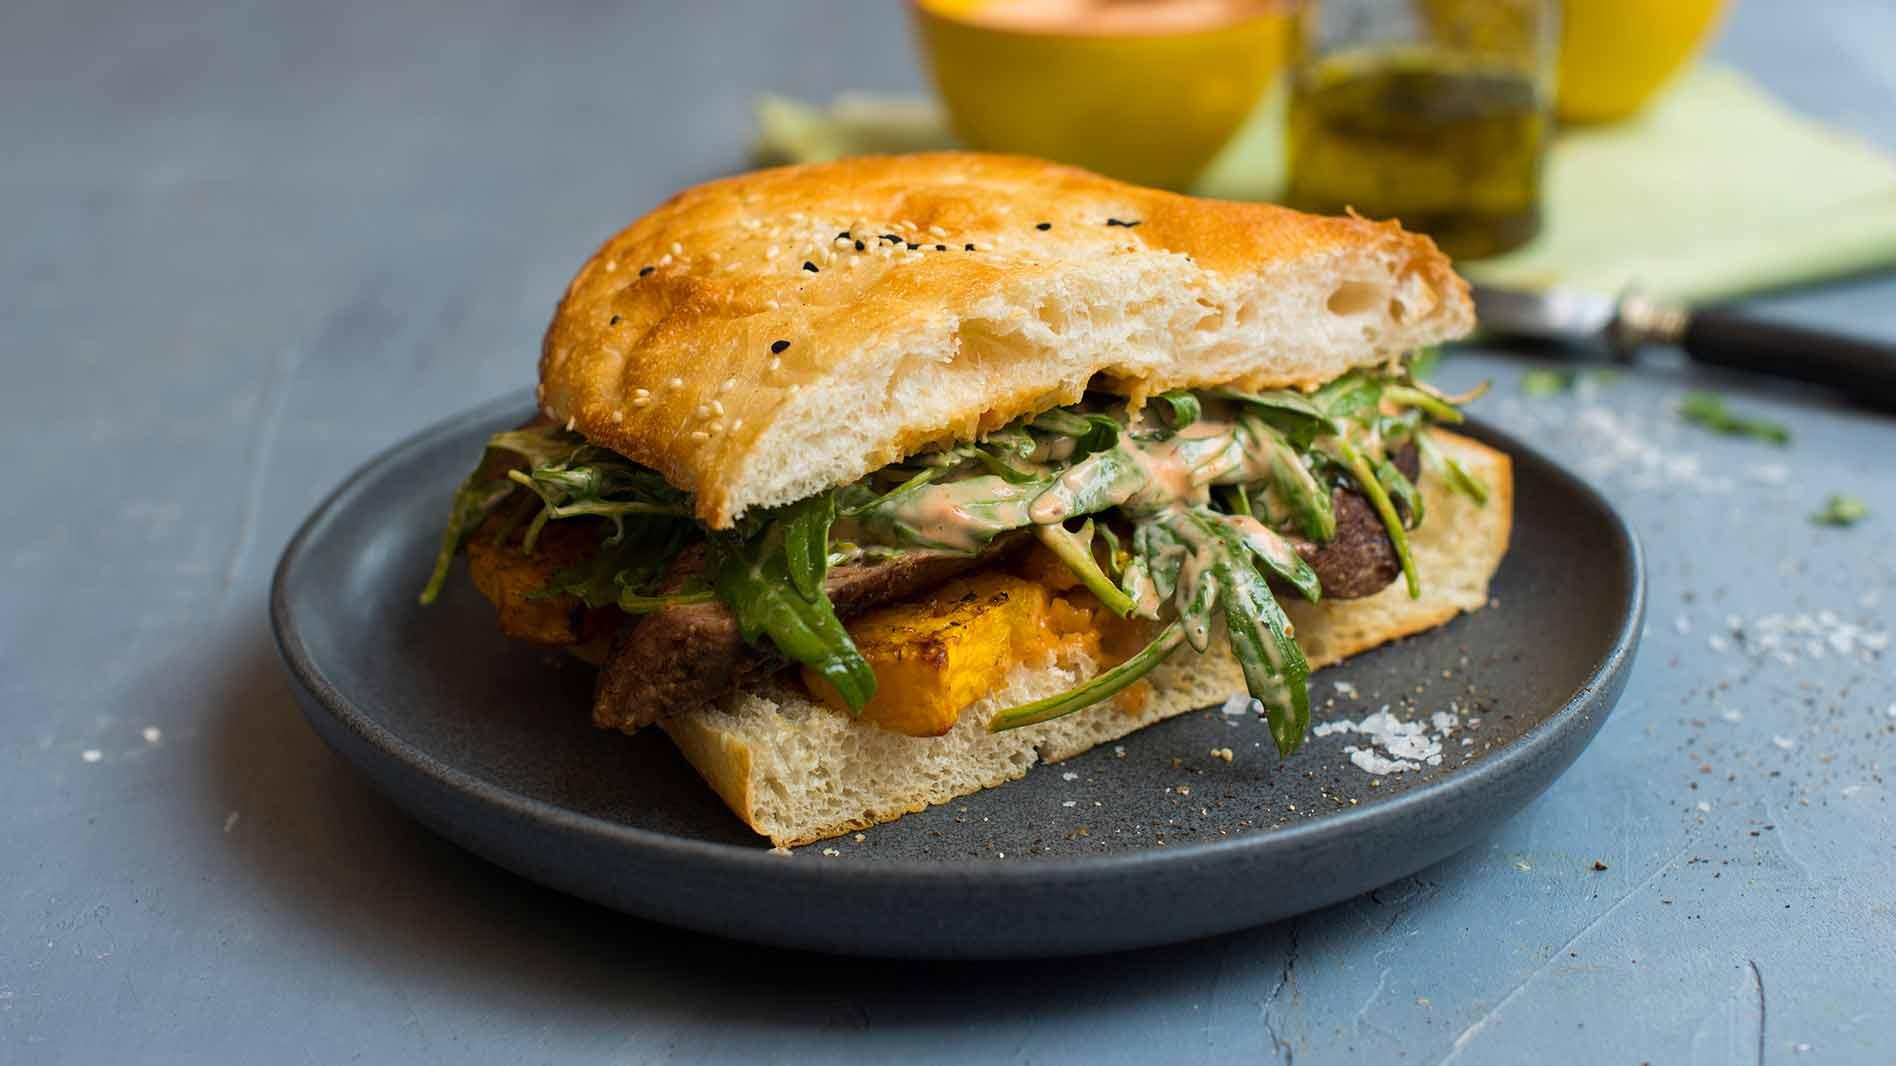 Shredded Moroccan Lamb, Pumpkin & Rocket on Grilled Turkish Bread